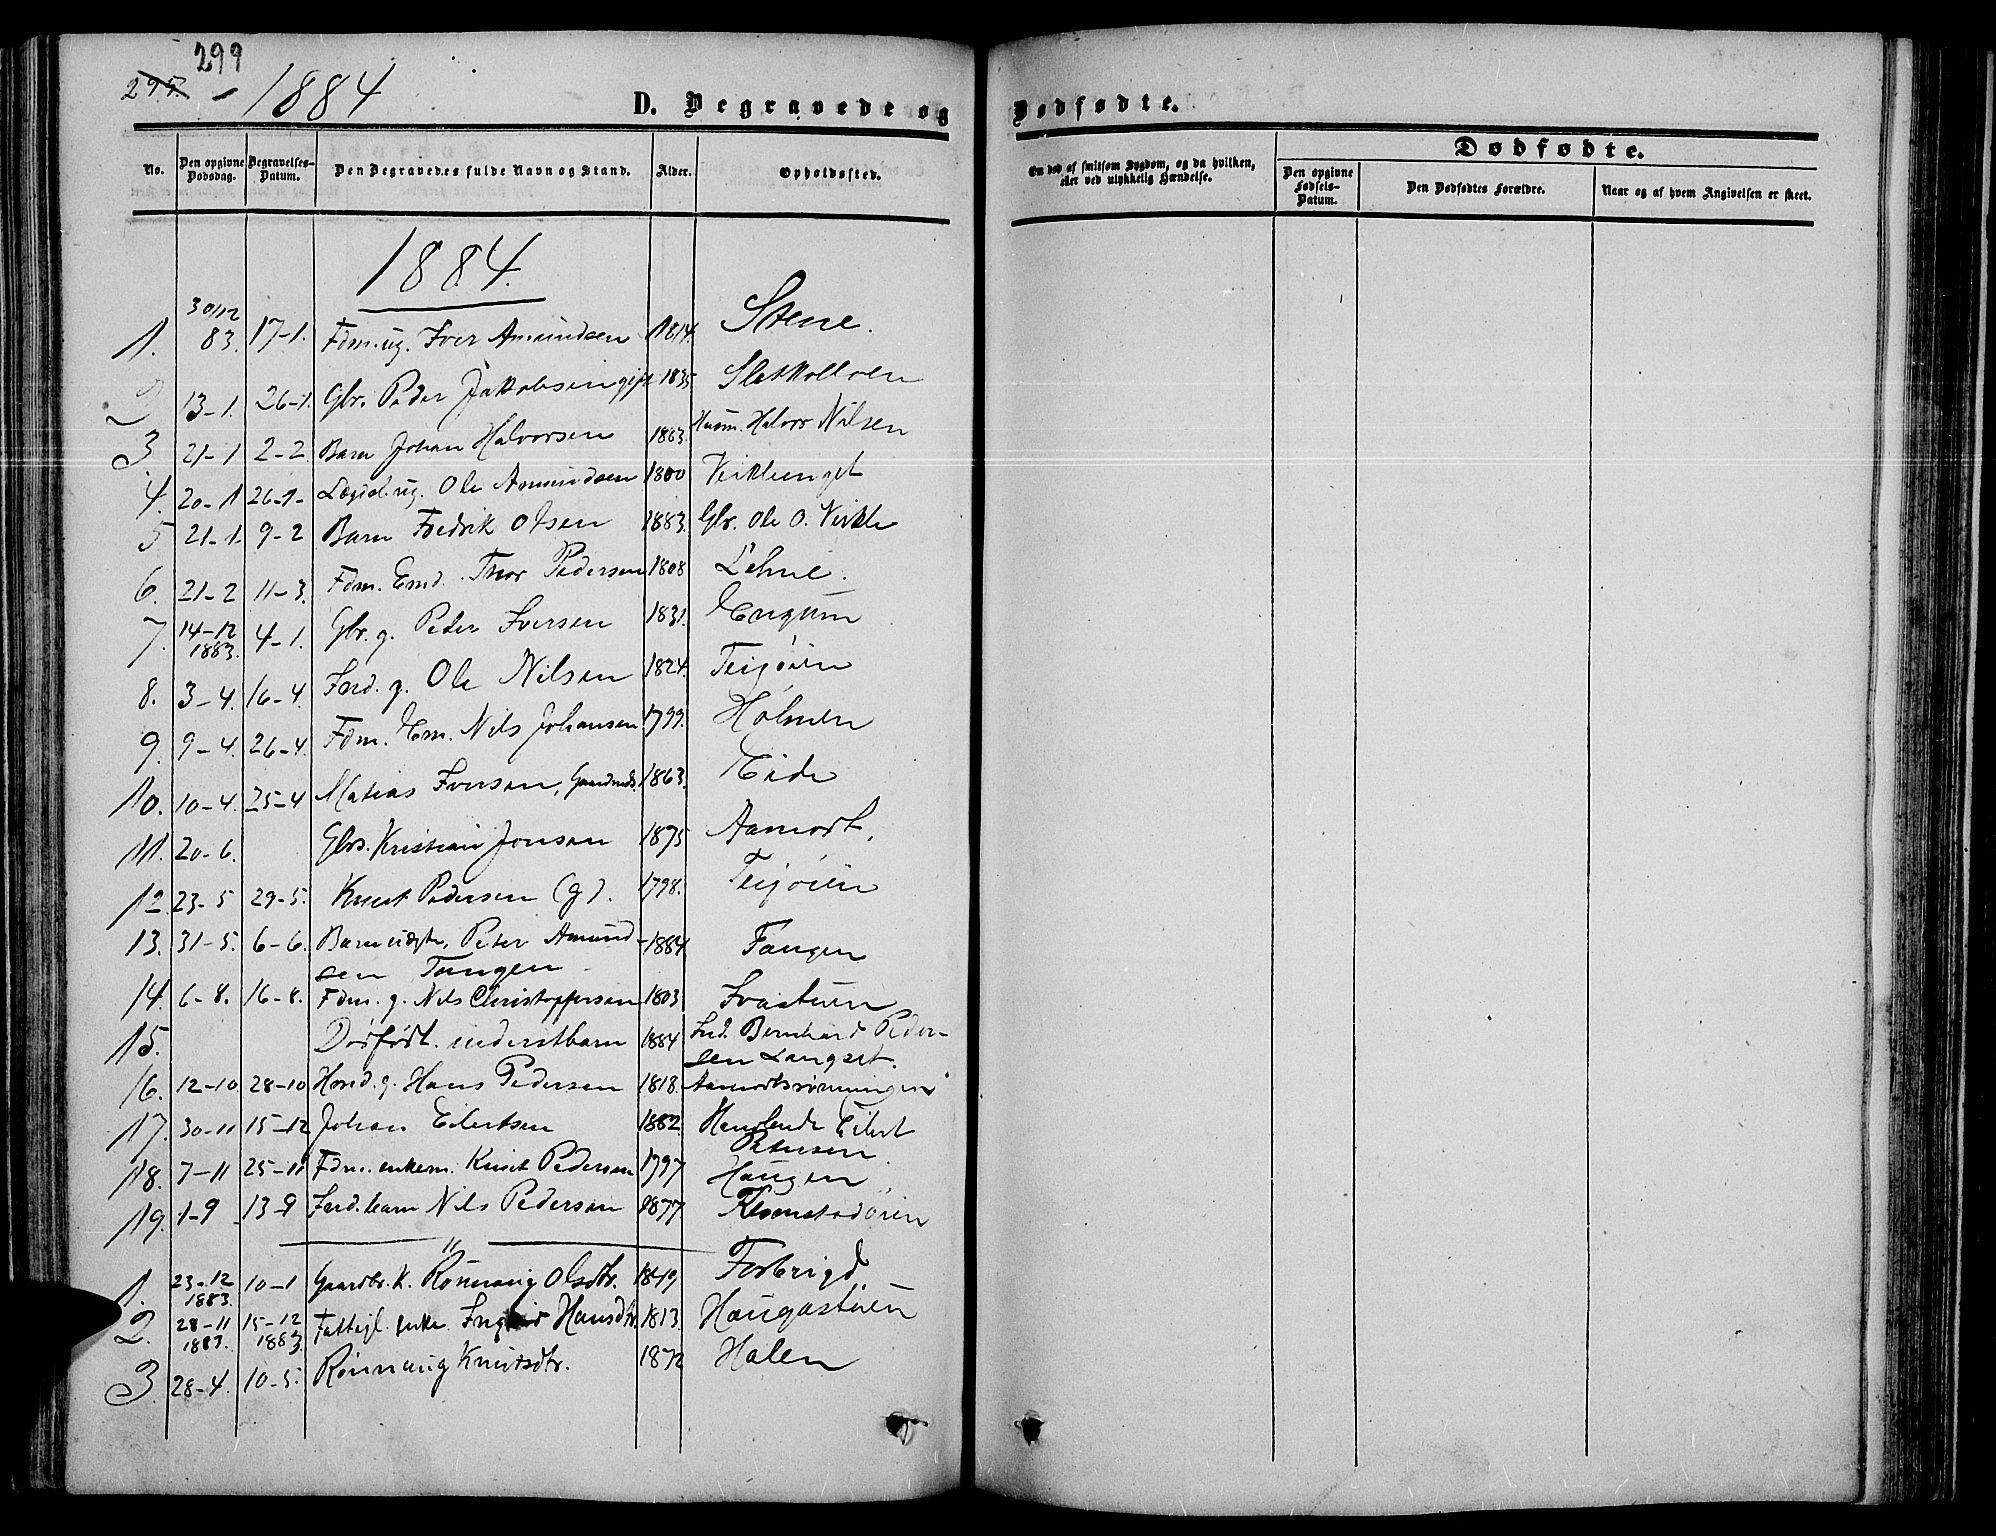 SAH, Nord-Fron prestekontor, Klokkerbok nr. 3, 1851-1886, s. 299